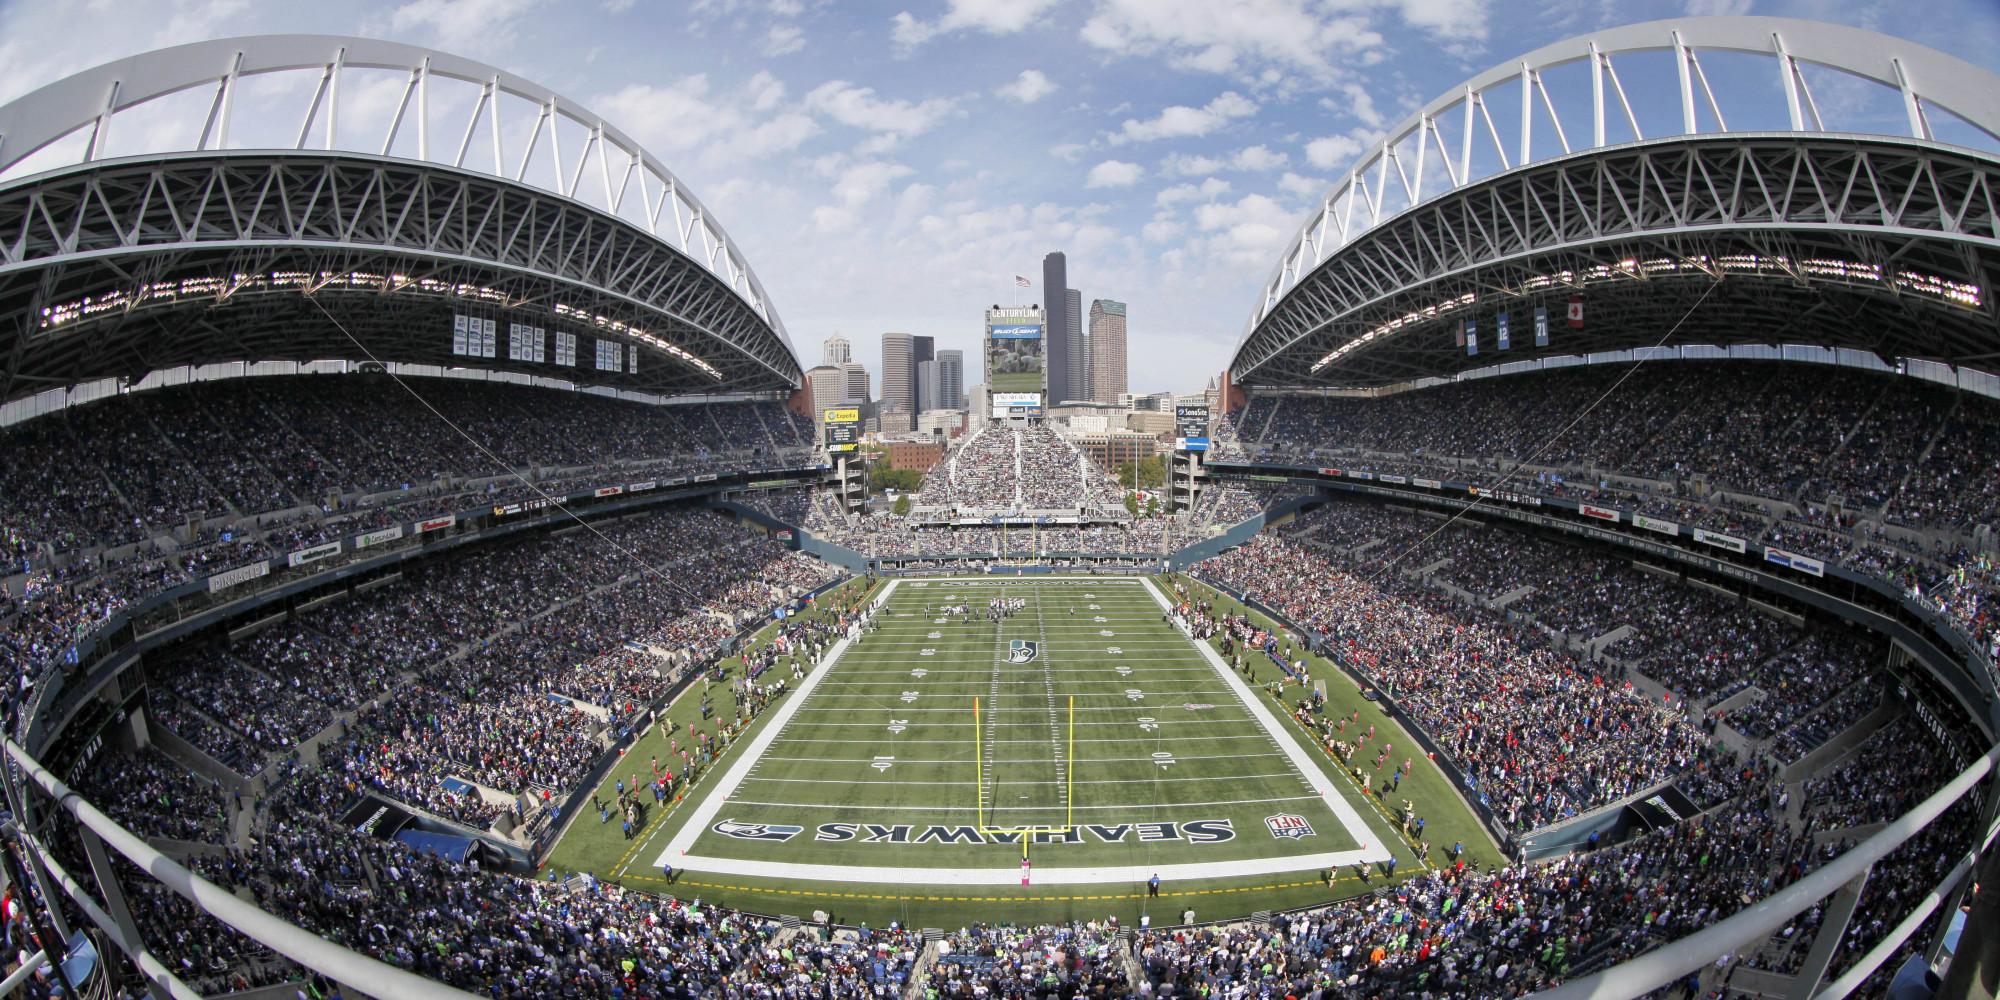 SEATTLE SEAHAWKS nfl football stadium o wallpaper 2000x1000 188261 2000x1000